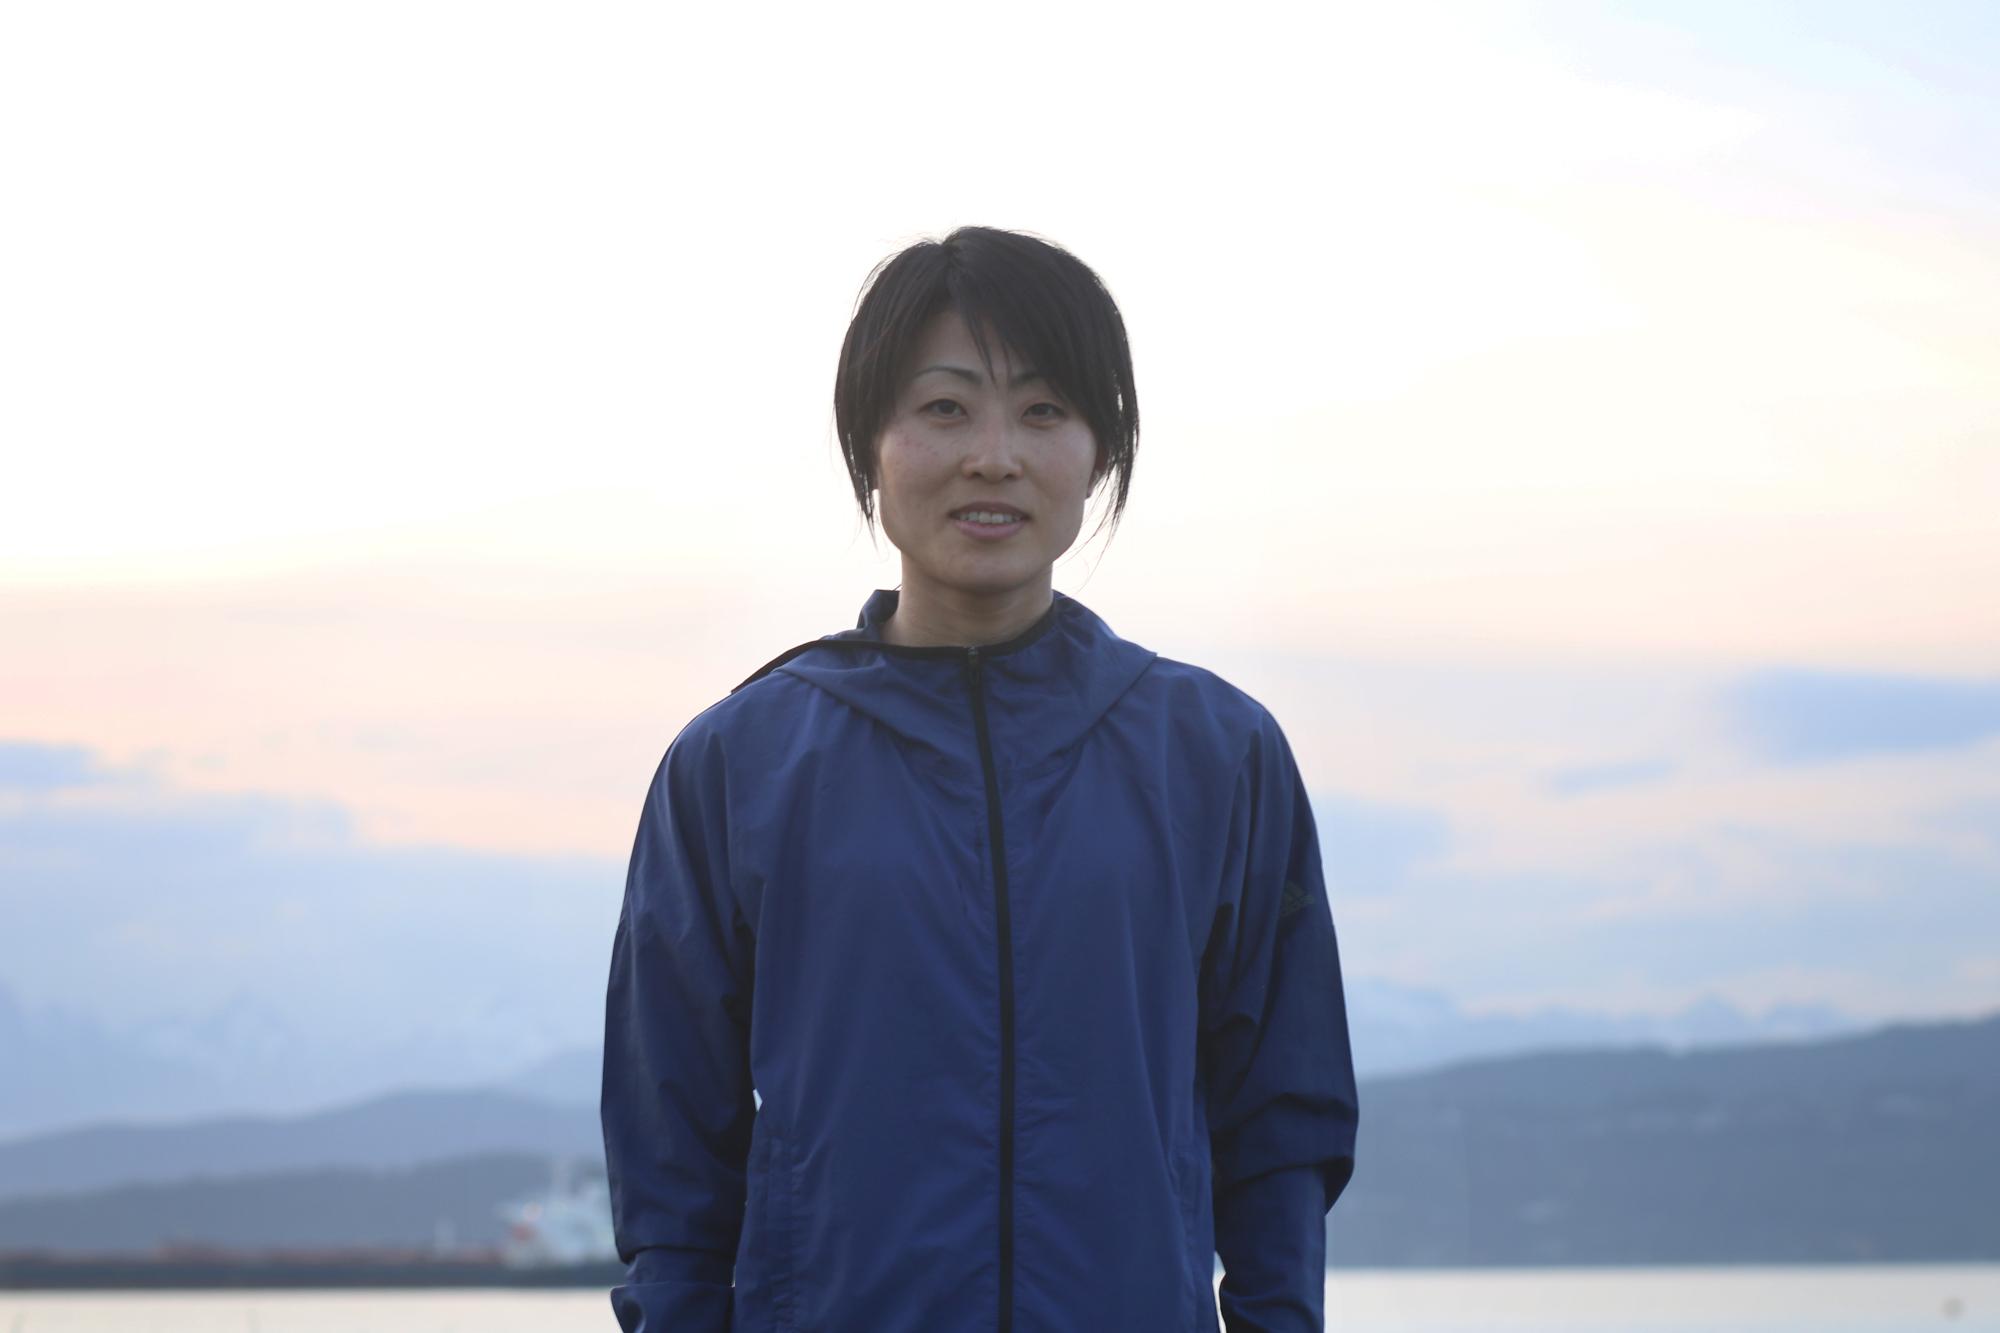 2019.M.BMOVM-9012-YukiMizuguchi-stevekojima@mktgfc-web